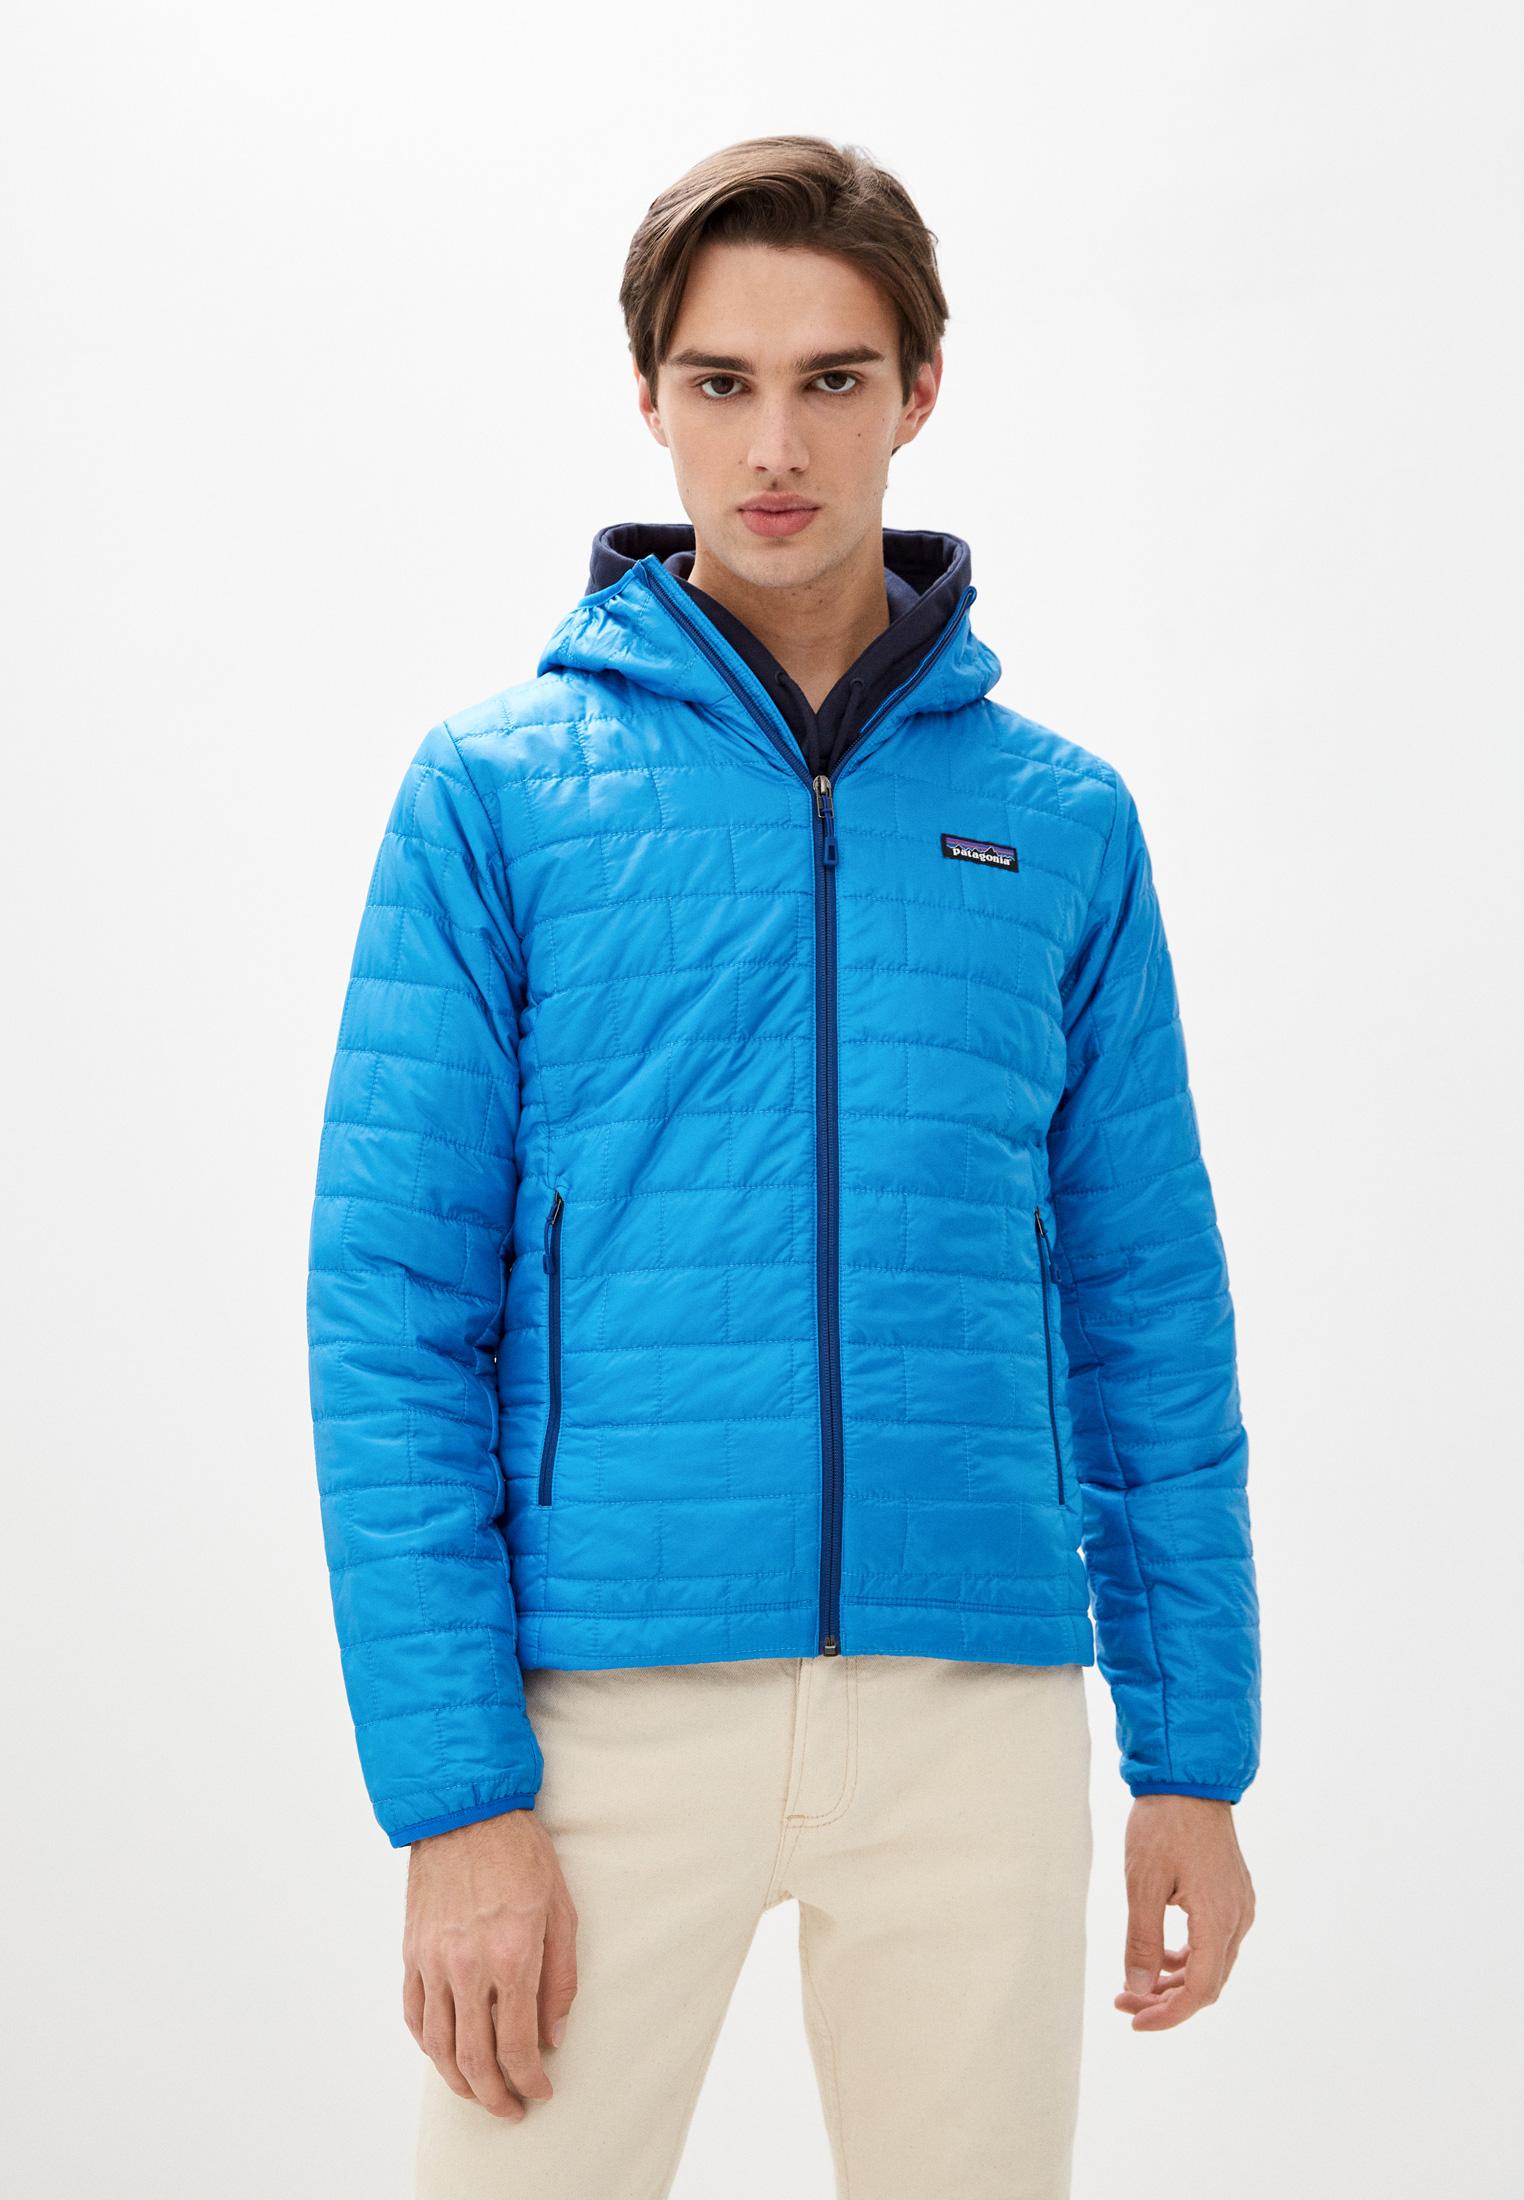 Мужская верхняя одежда Patagonia 84222